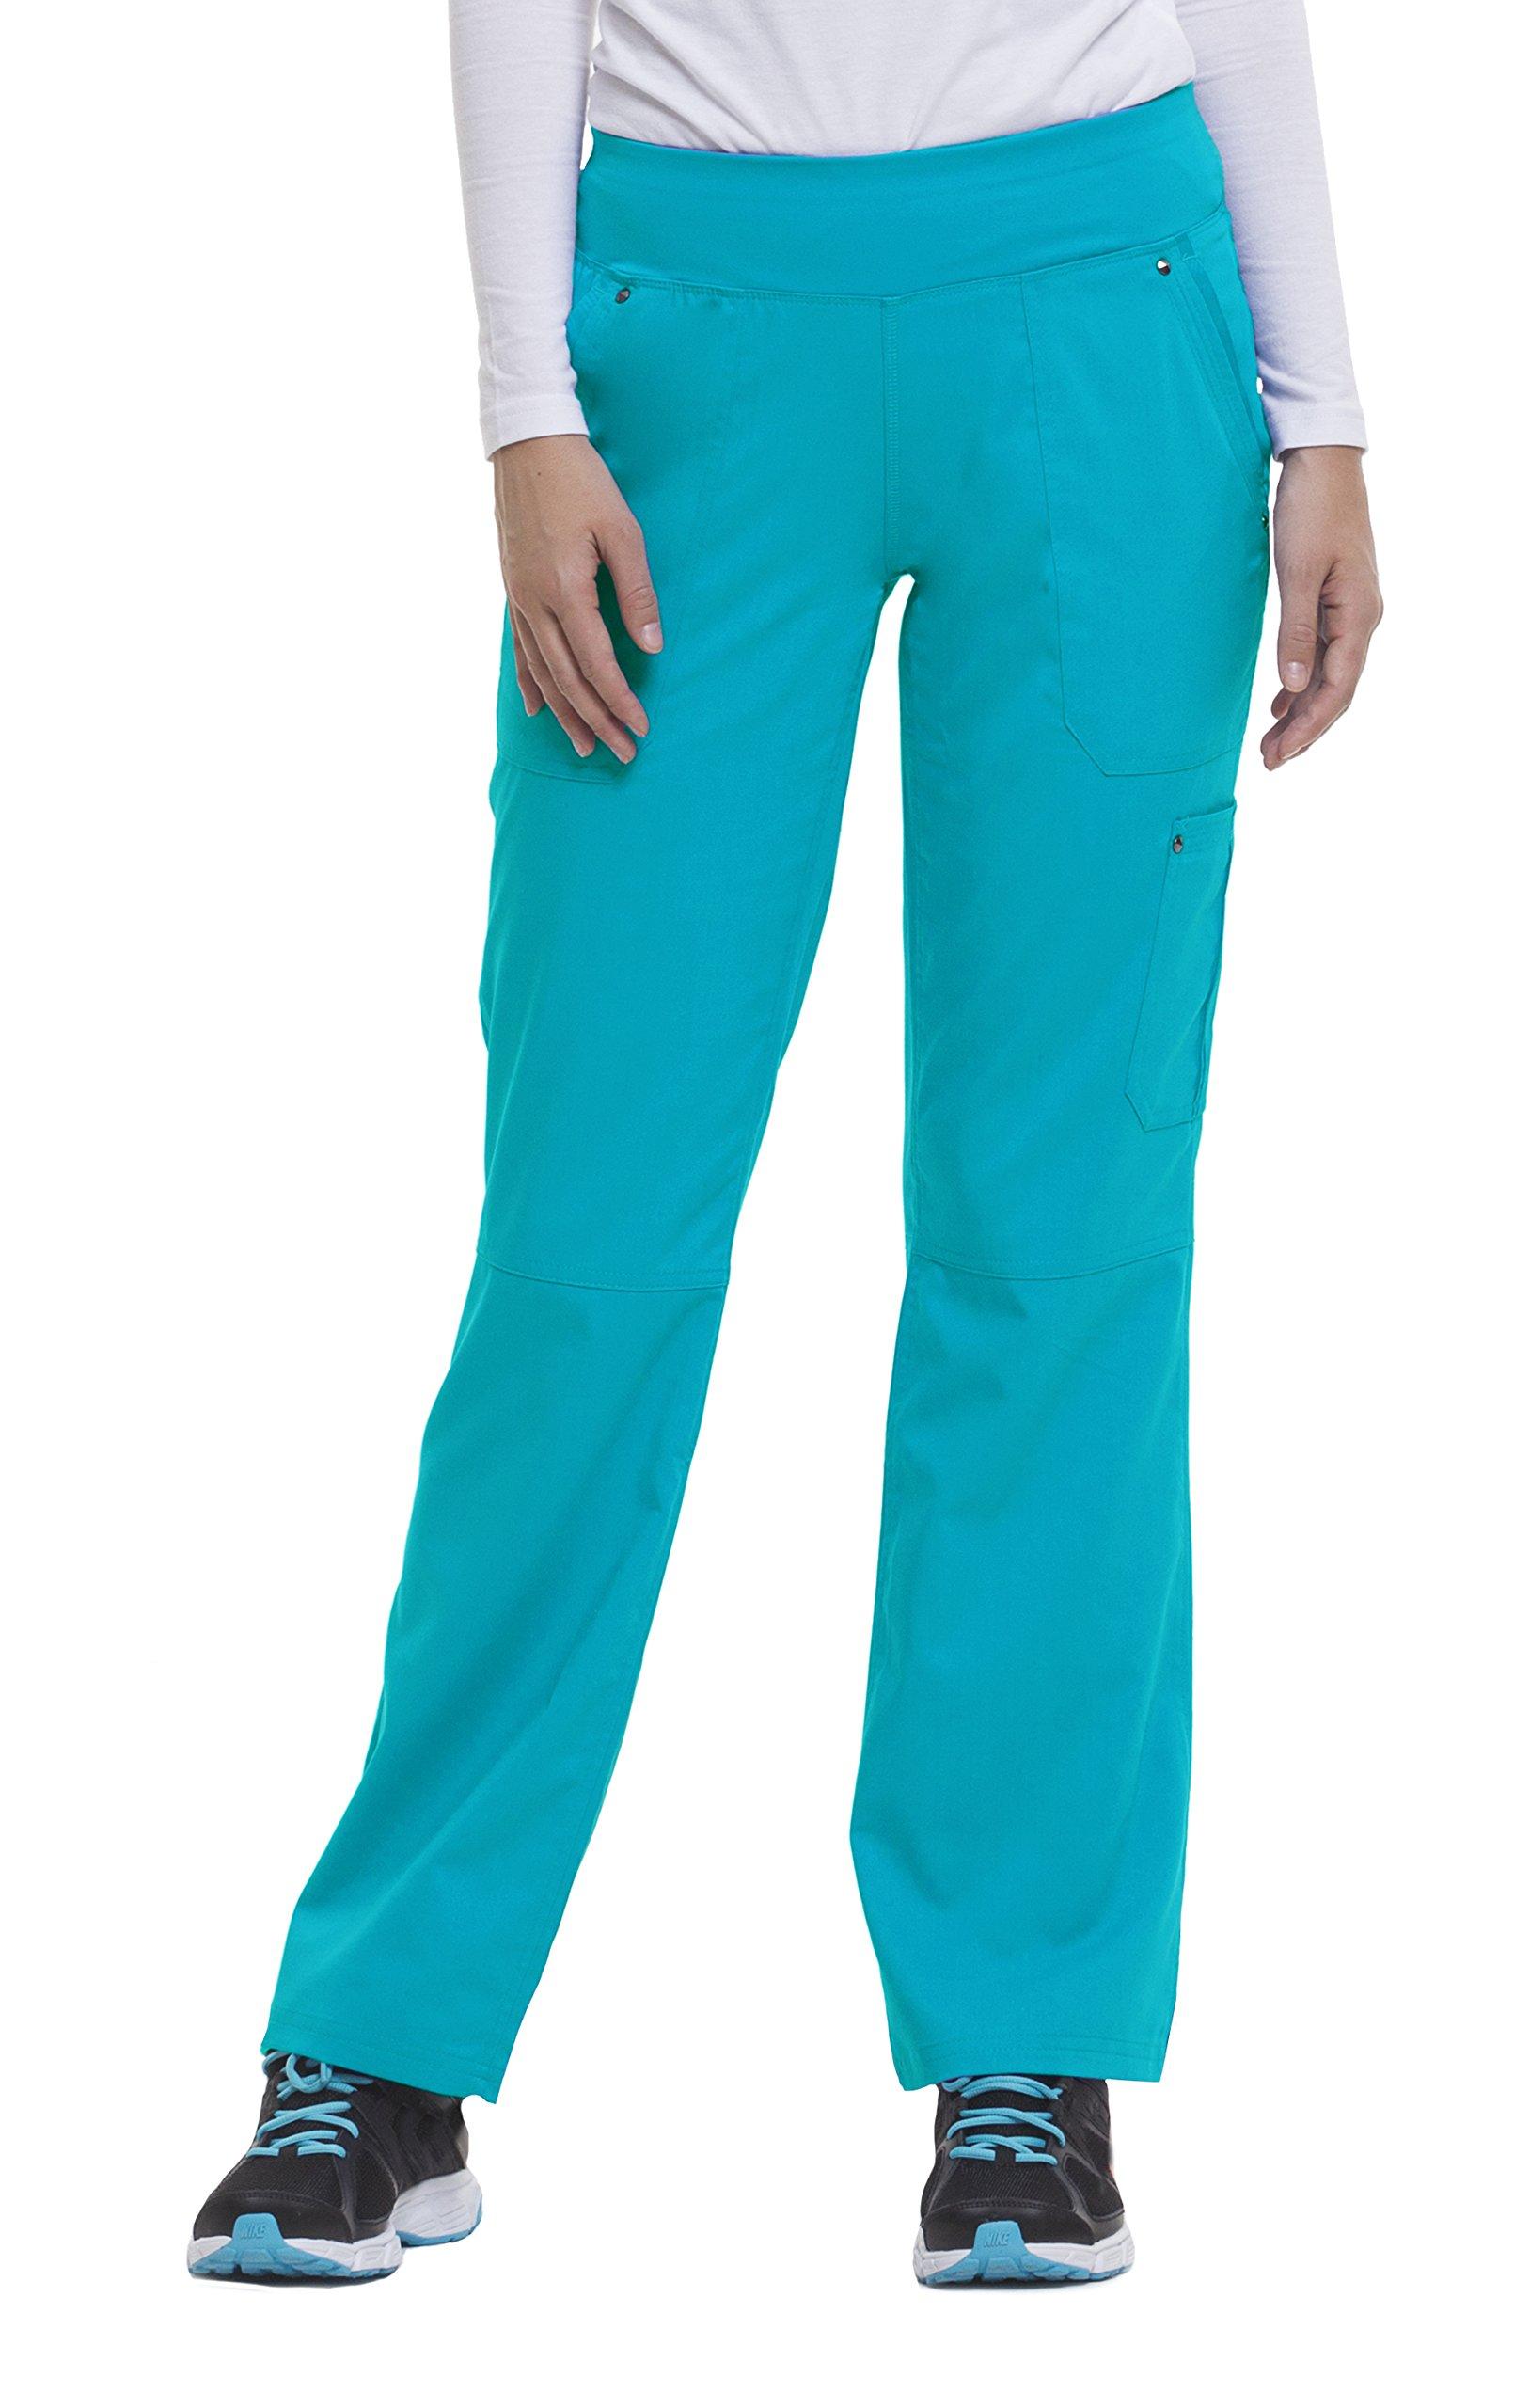 Healing Hands Purple Label Yoga Women's Tori 9133 5 Pocket Knit Waist Pant Teal- X-Small